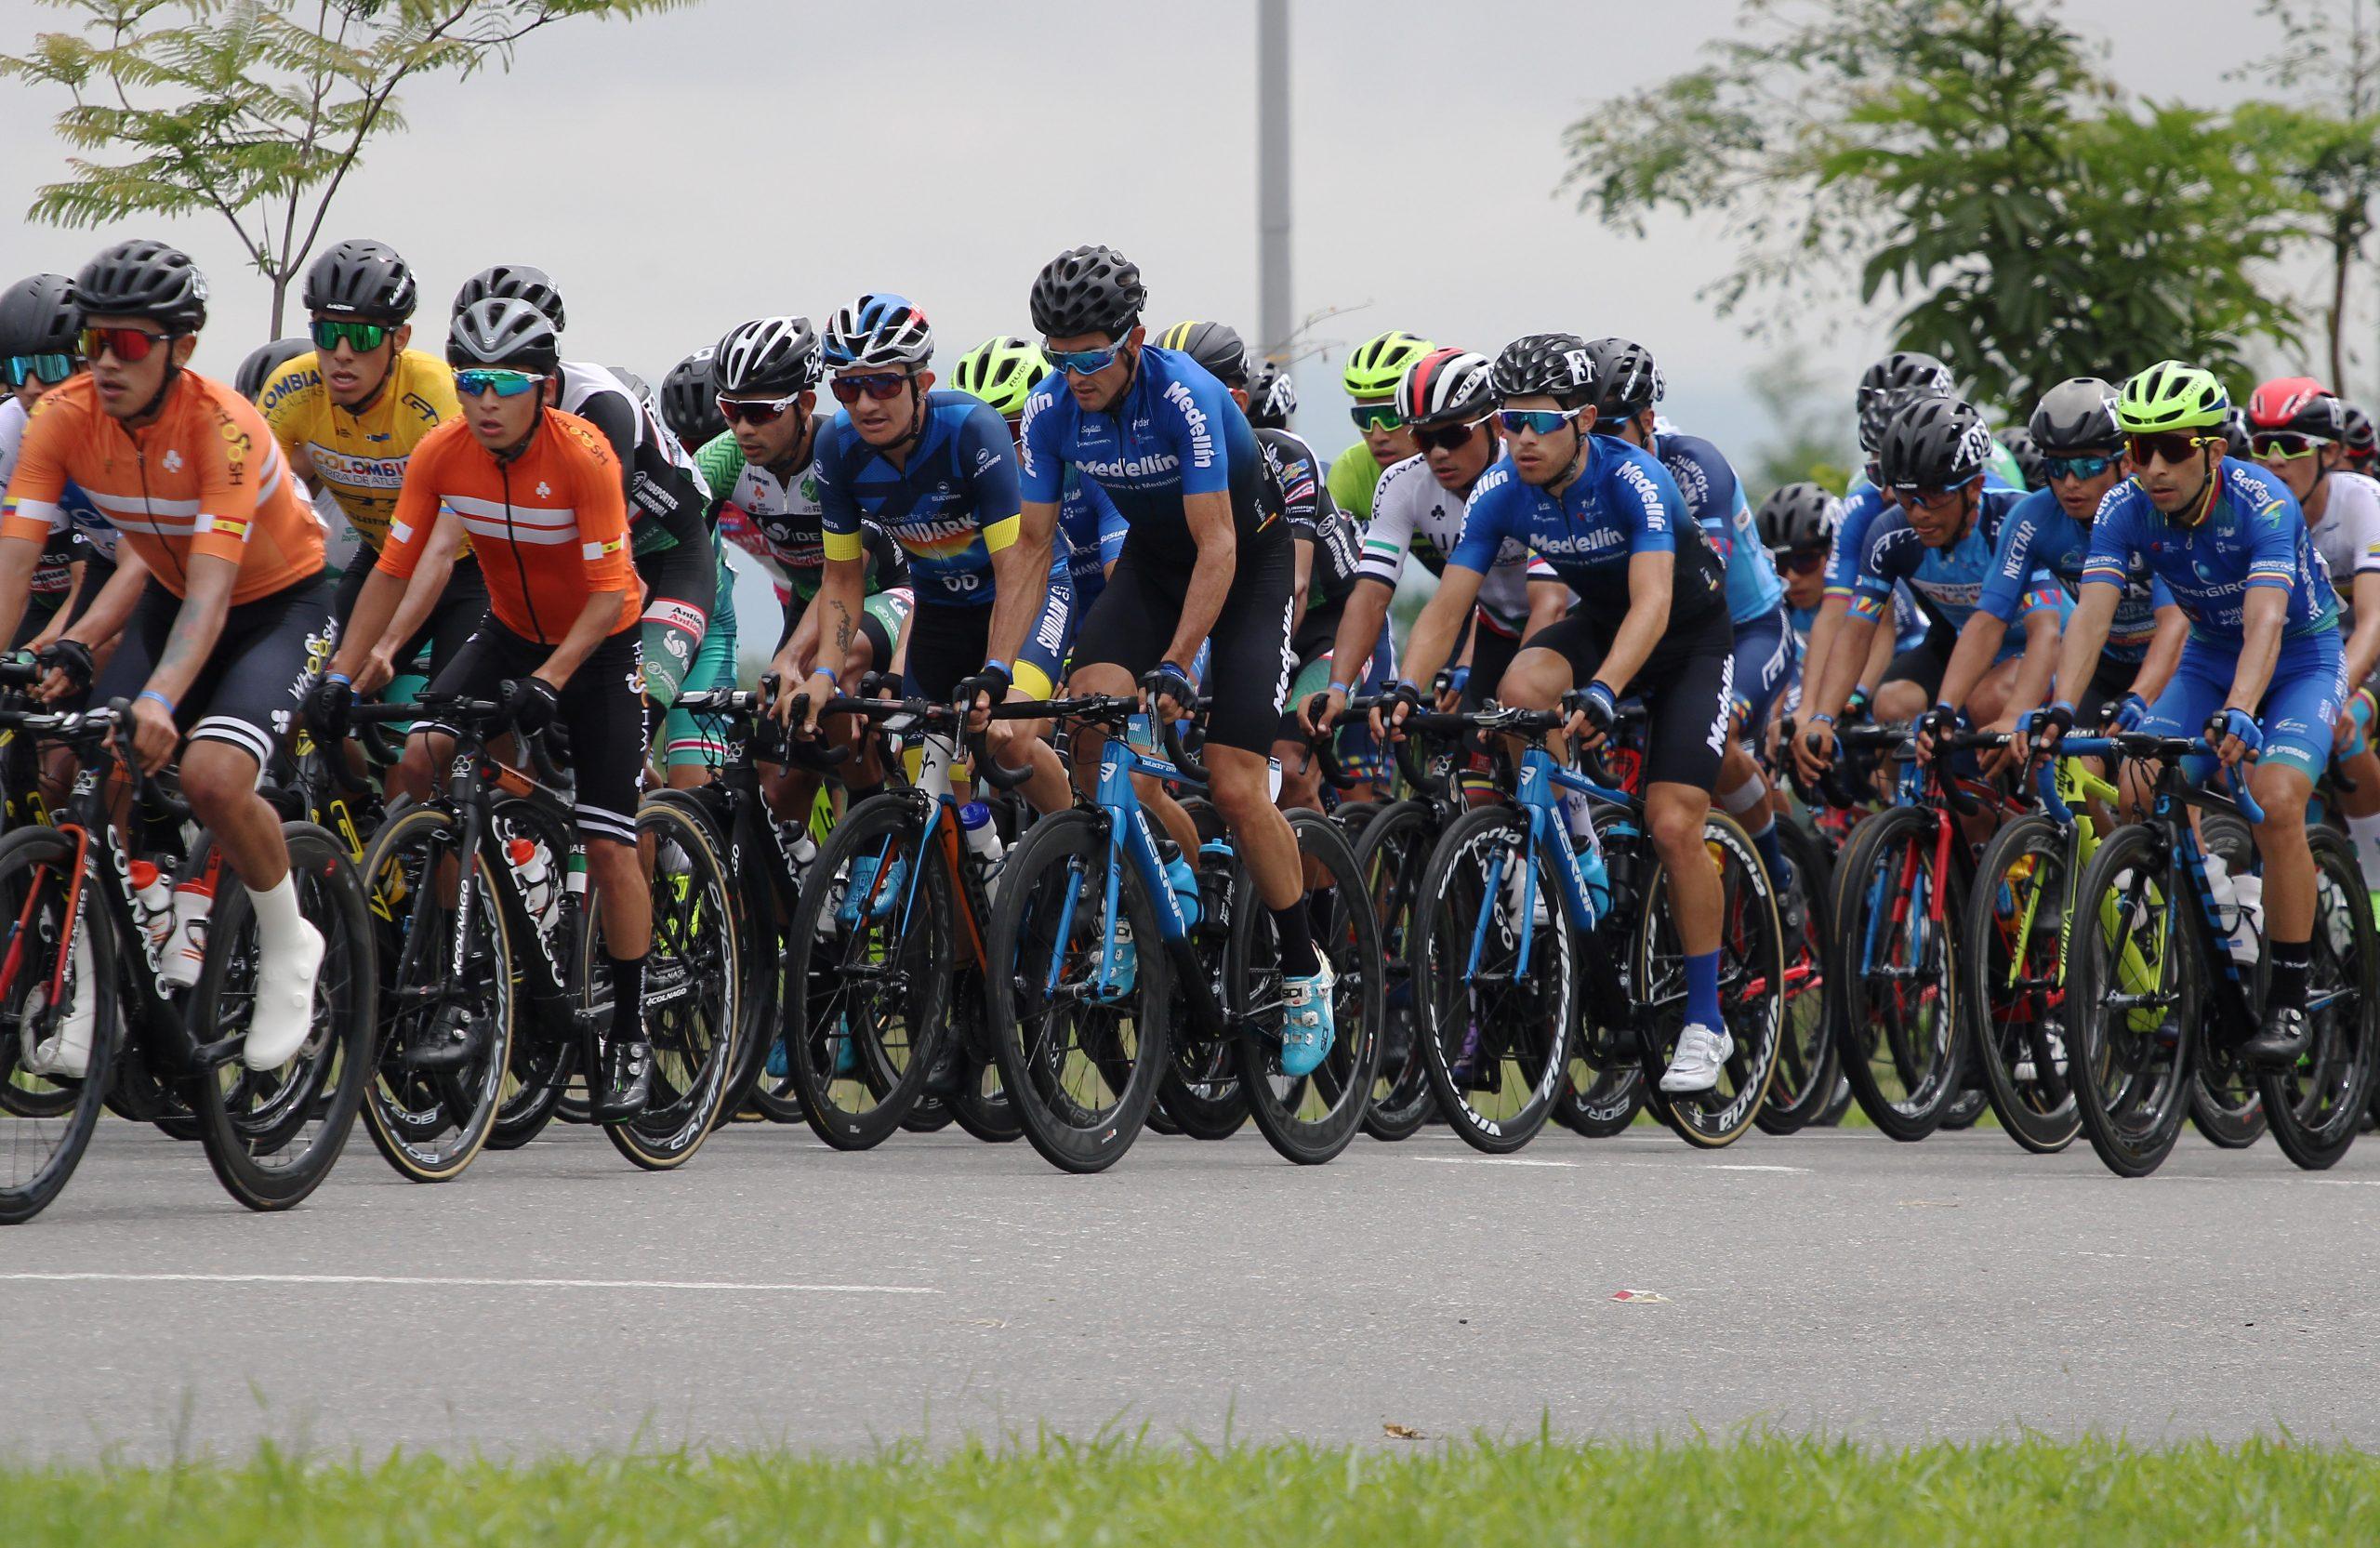 ¡HISTÓRICO! La Vuelta a Colombia 2021 no pasará por Antioquia